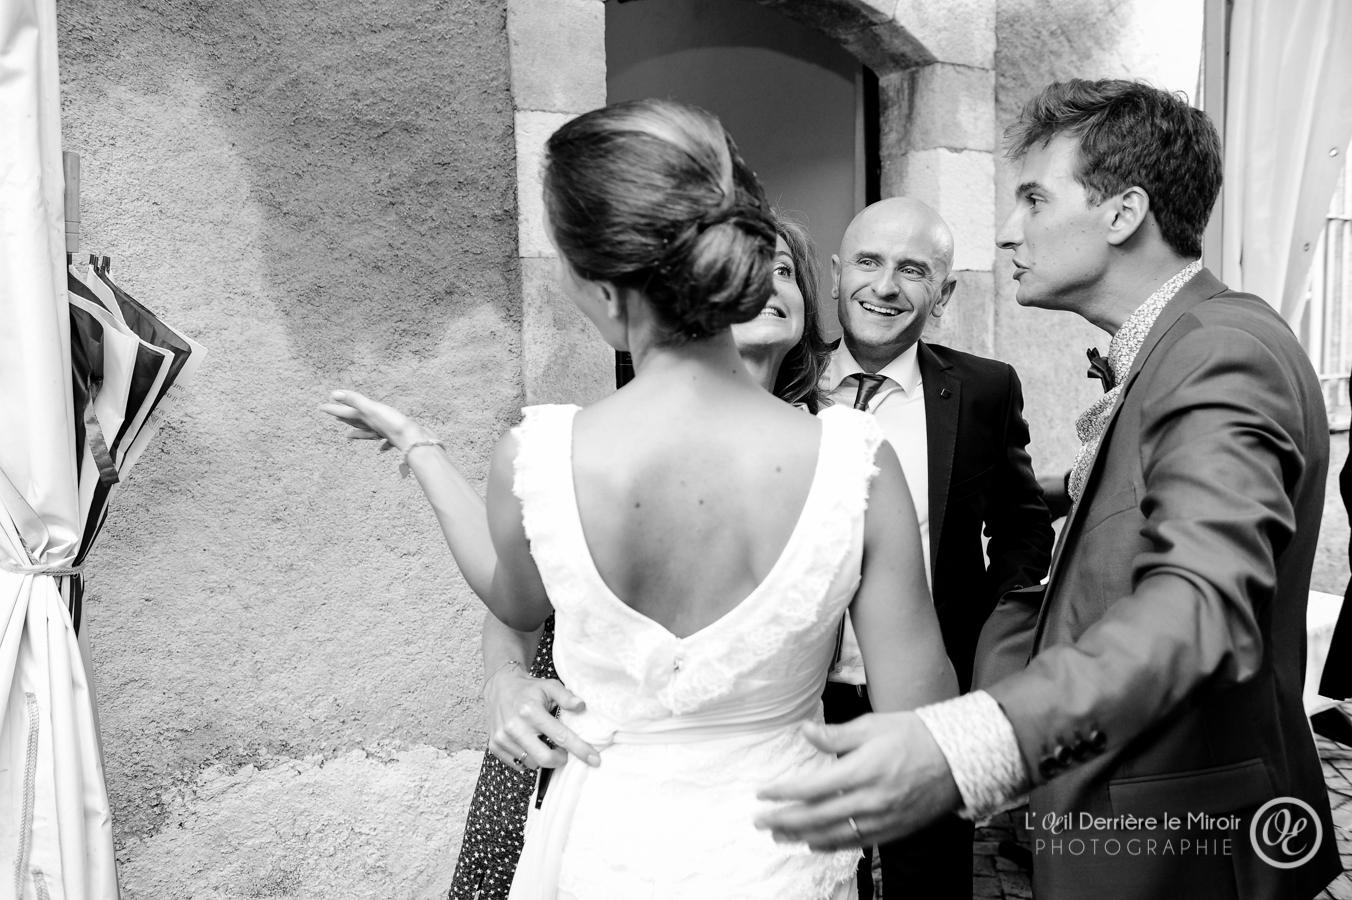 Photographe-Mariage-grasse-loeilderrierelemiroir-jt-113